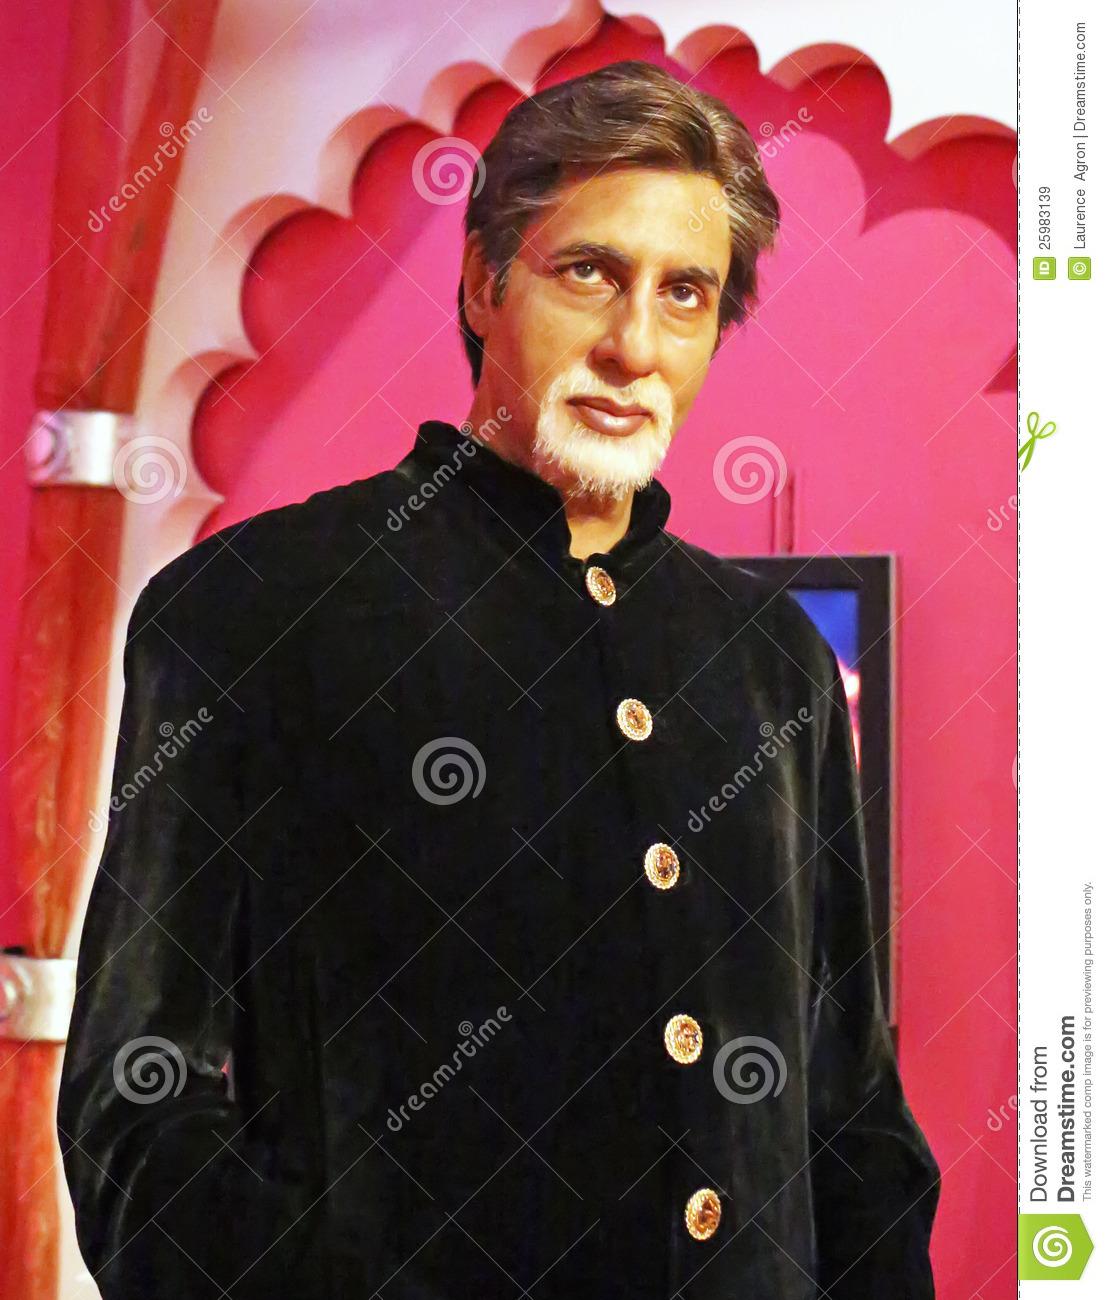 Amitabh bachchan clipart download.